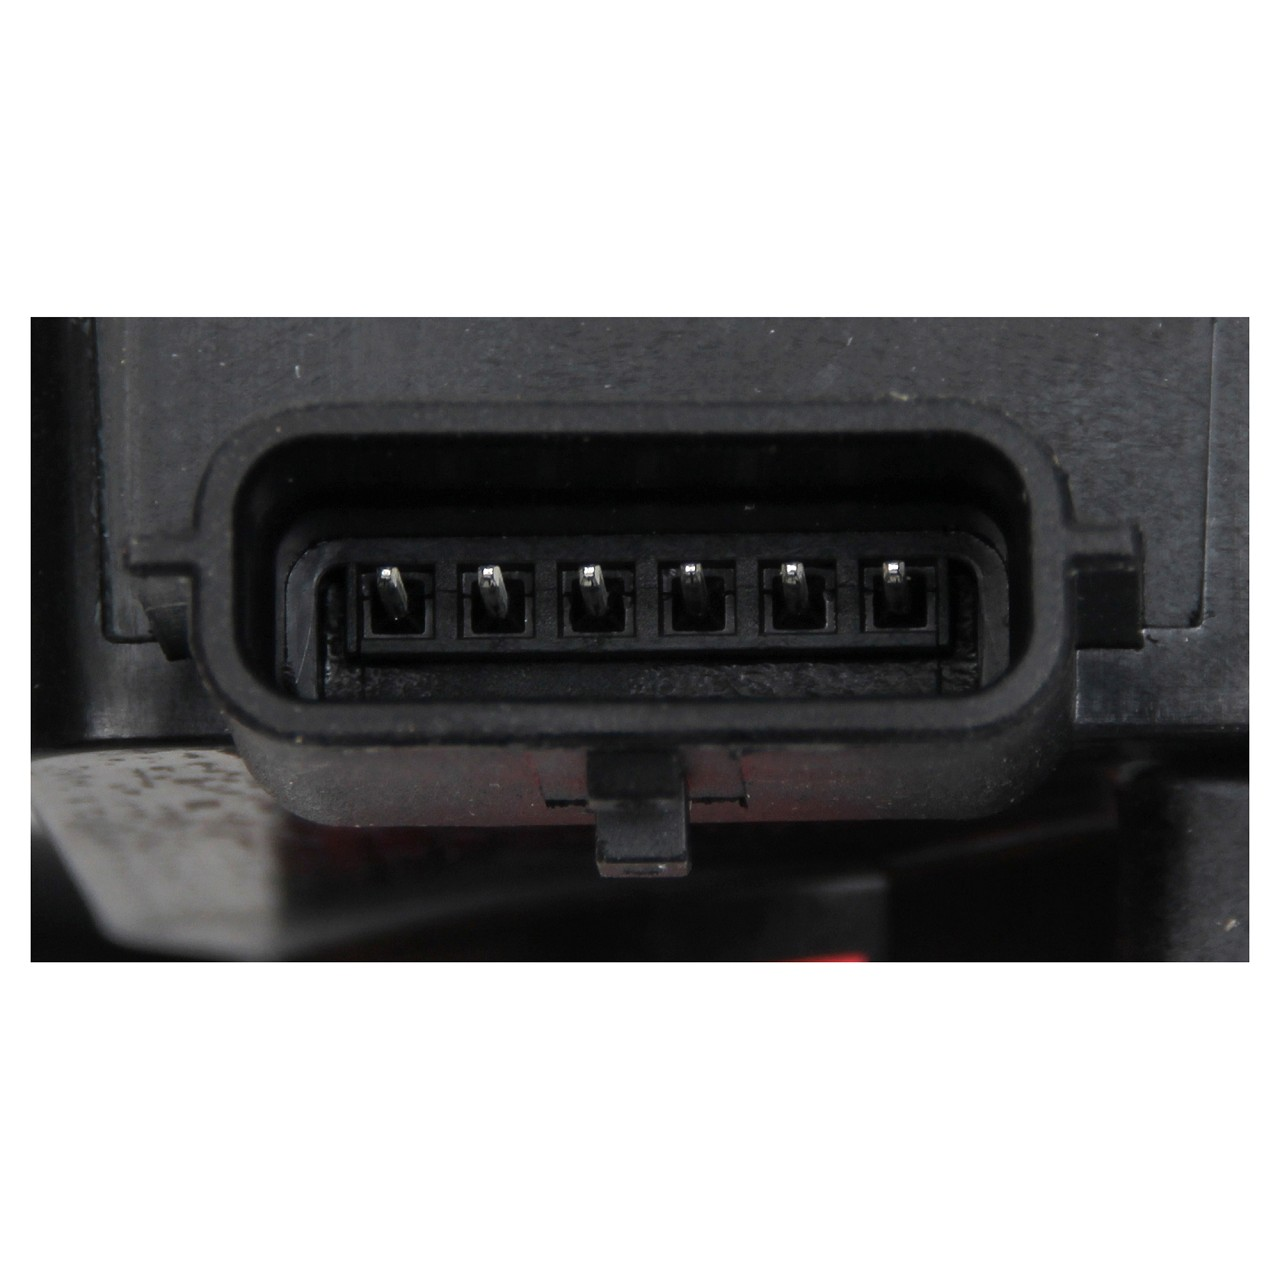 ORIGINAL Renault Gaspedalstellungssensor Gaspedalsensor 8200297335 für CLIO III